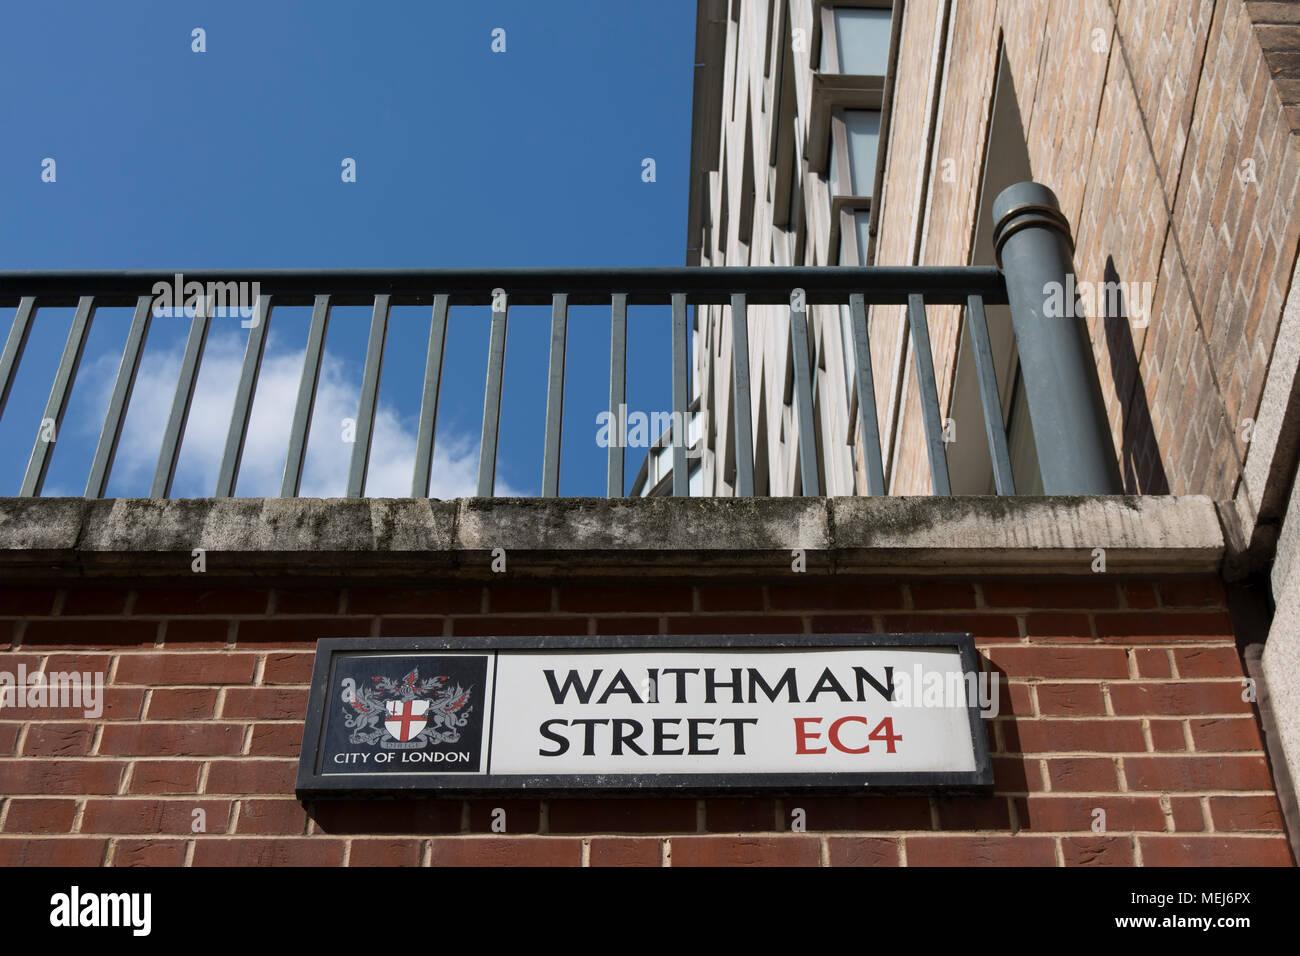 city of london street name sign for waithman street - Stock Image